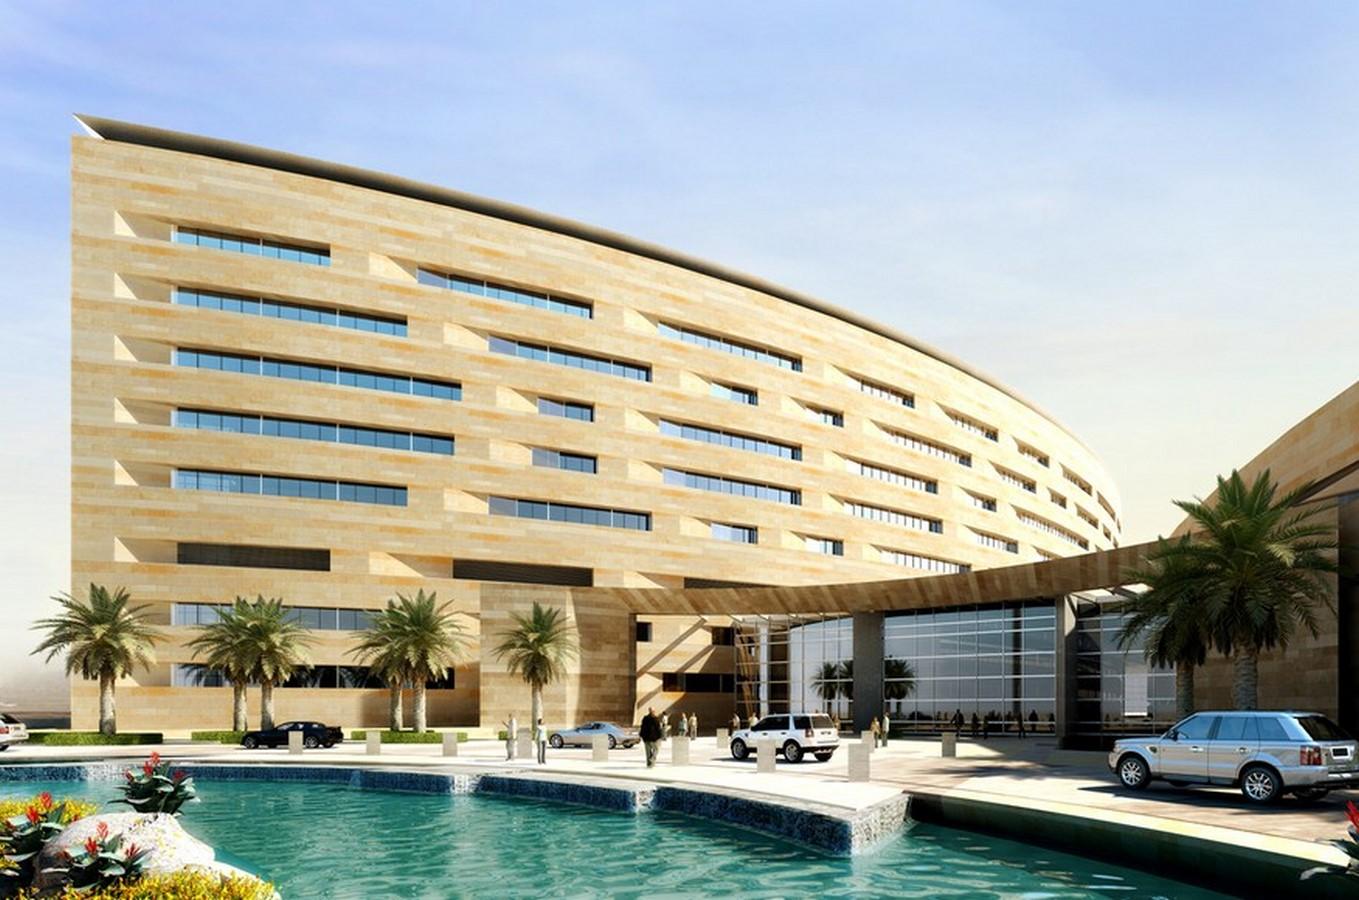 Zayed Military Hospital, Abu Dhabi - Sheet1